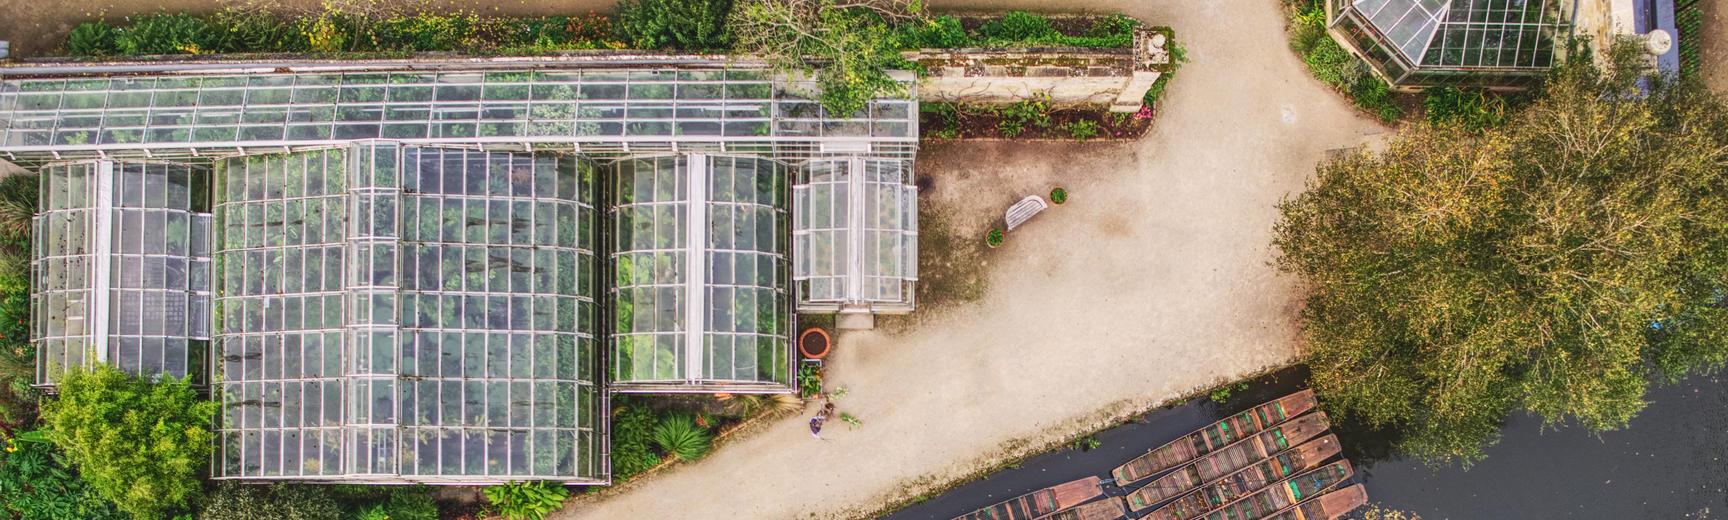 botanic garden  glasshouses  drone  punts  autumn